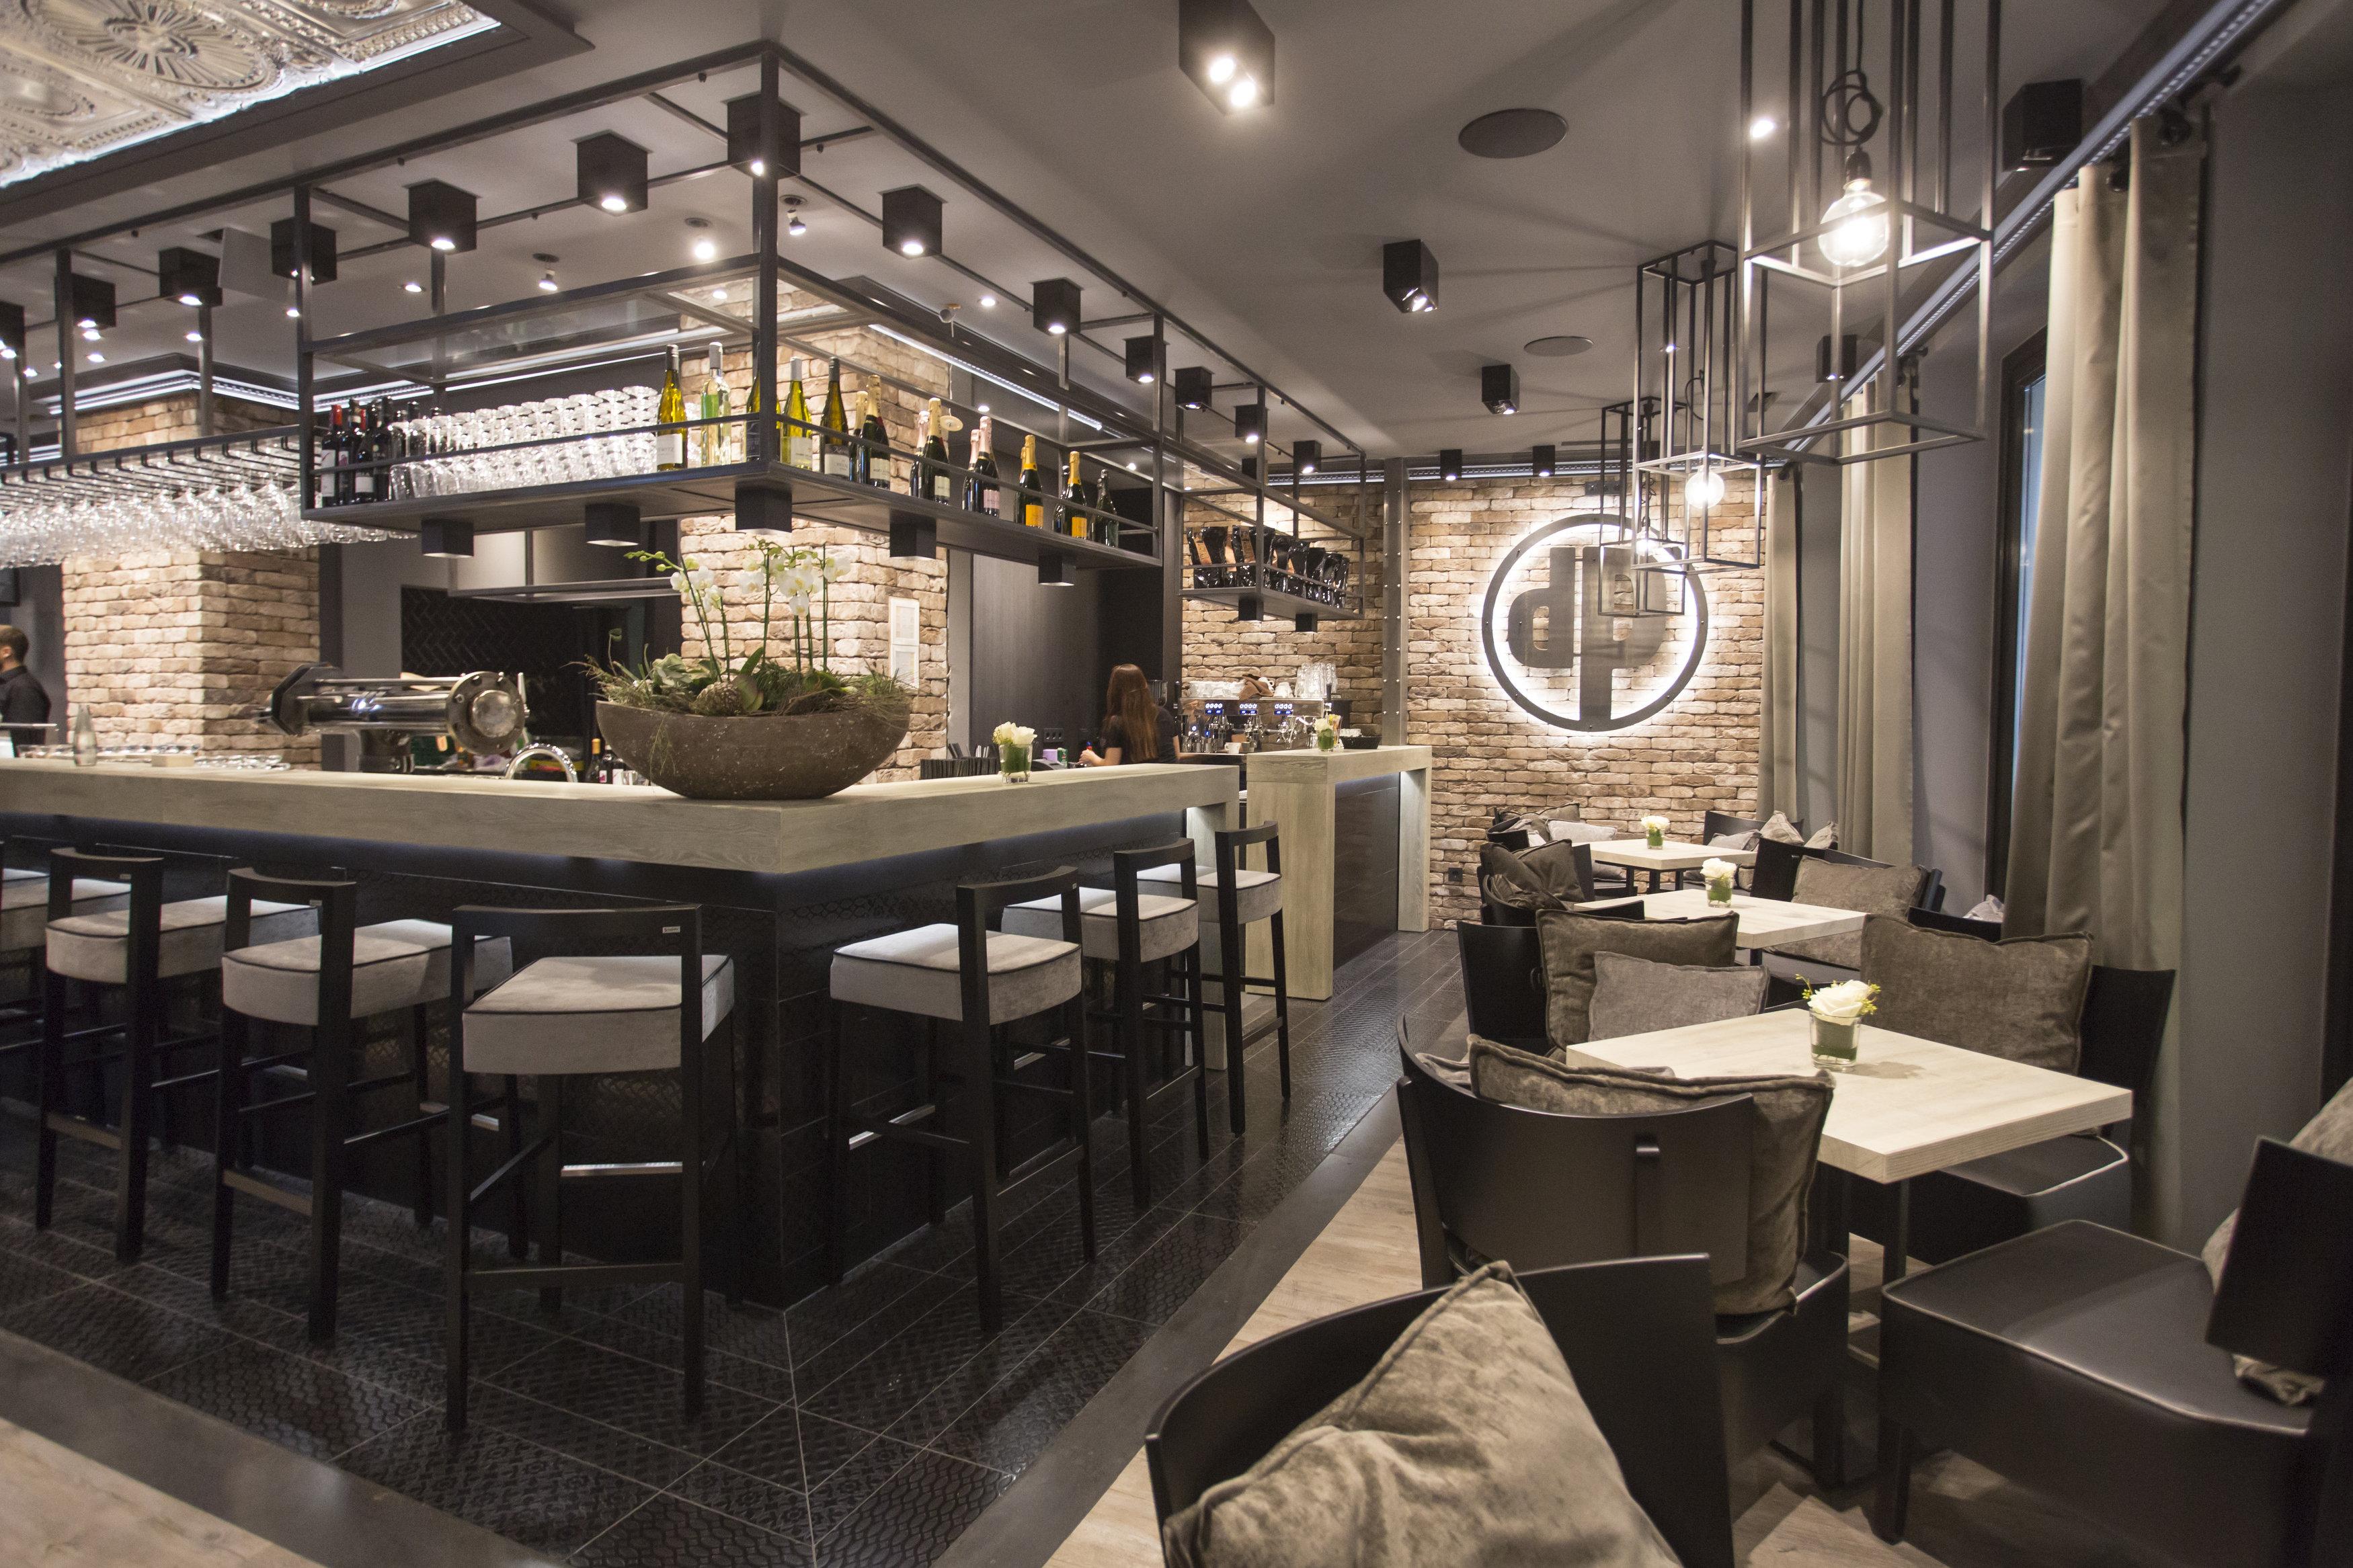 gastst tten coffee bars in n rnberg in vebidoobiz finden. Black Bedroom Furniture Sets. Home Design Ideas